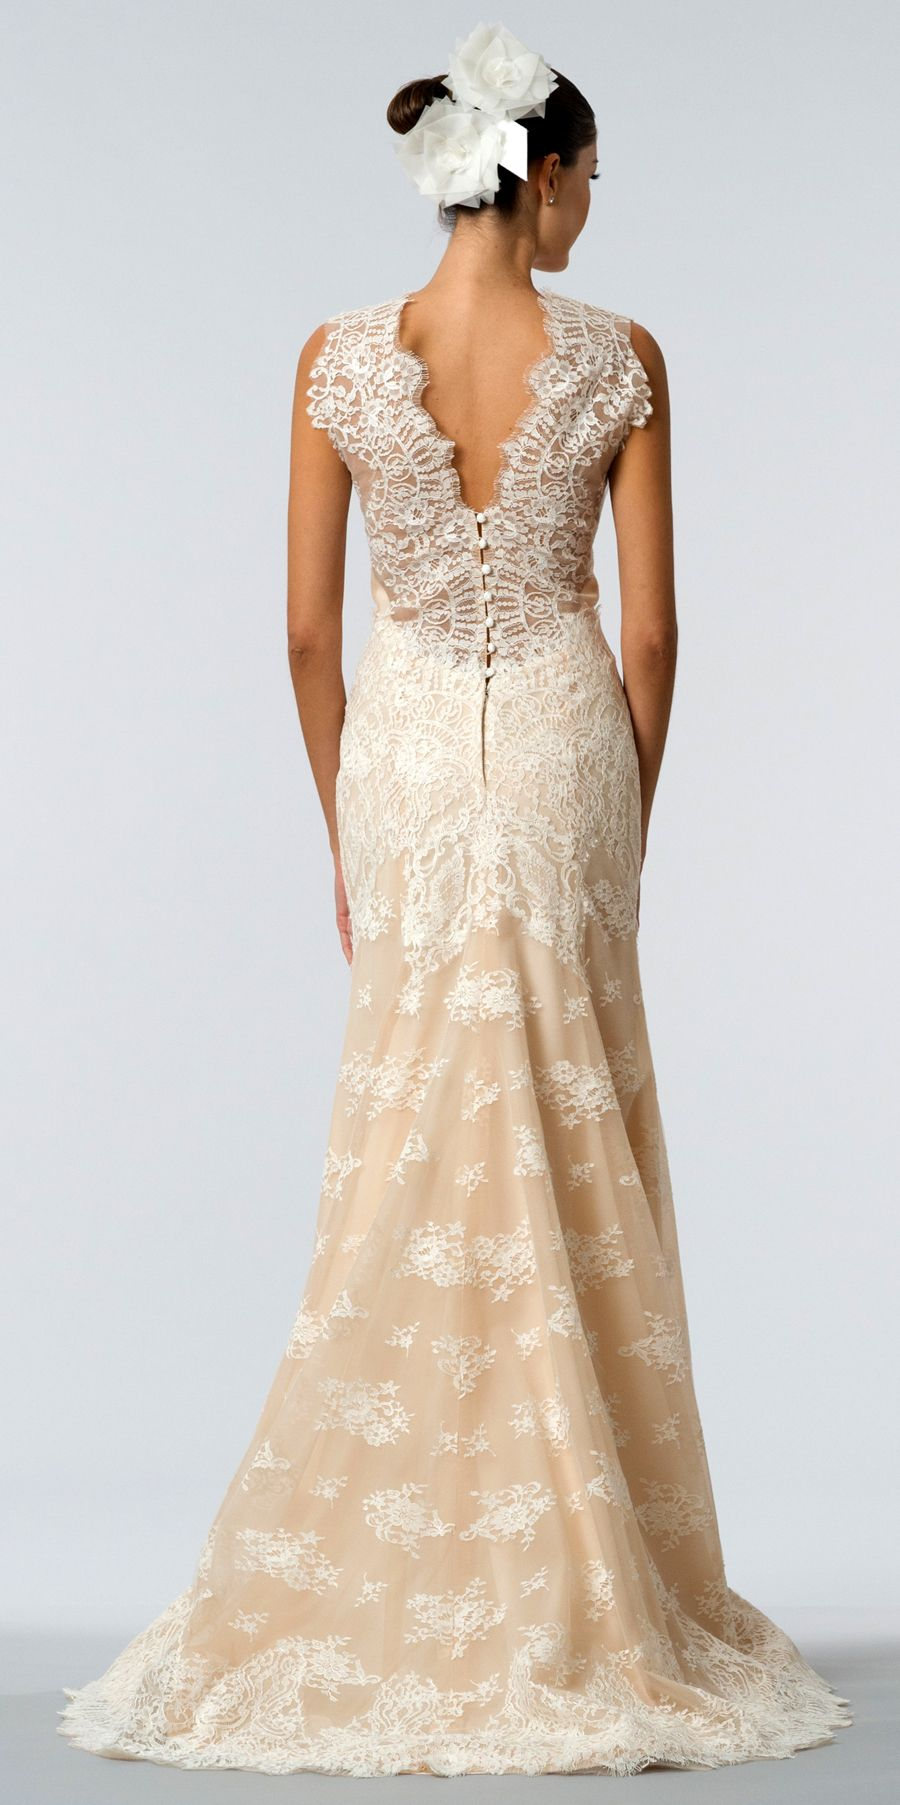 2016 Blush Wedding Dress Lace Gown Carolina Herrera Daisy